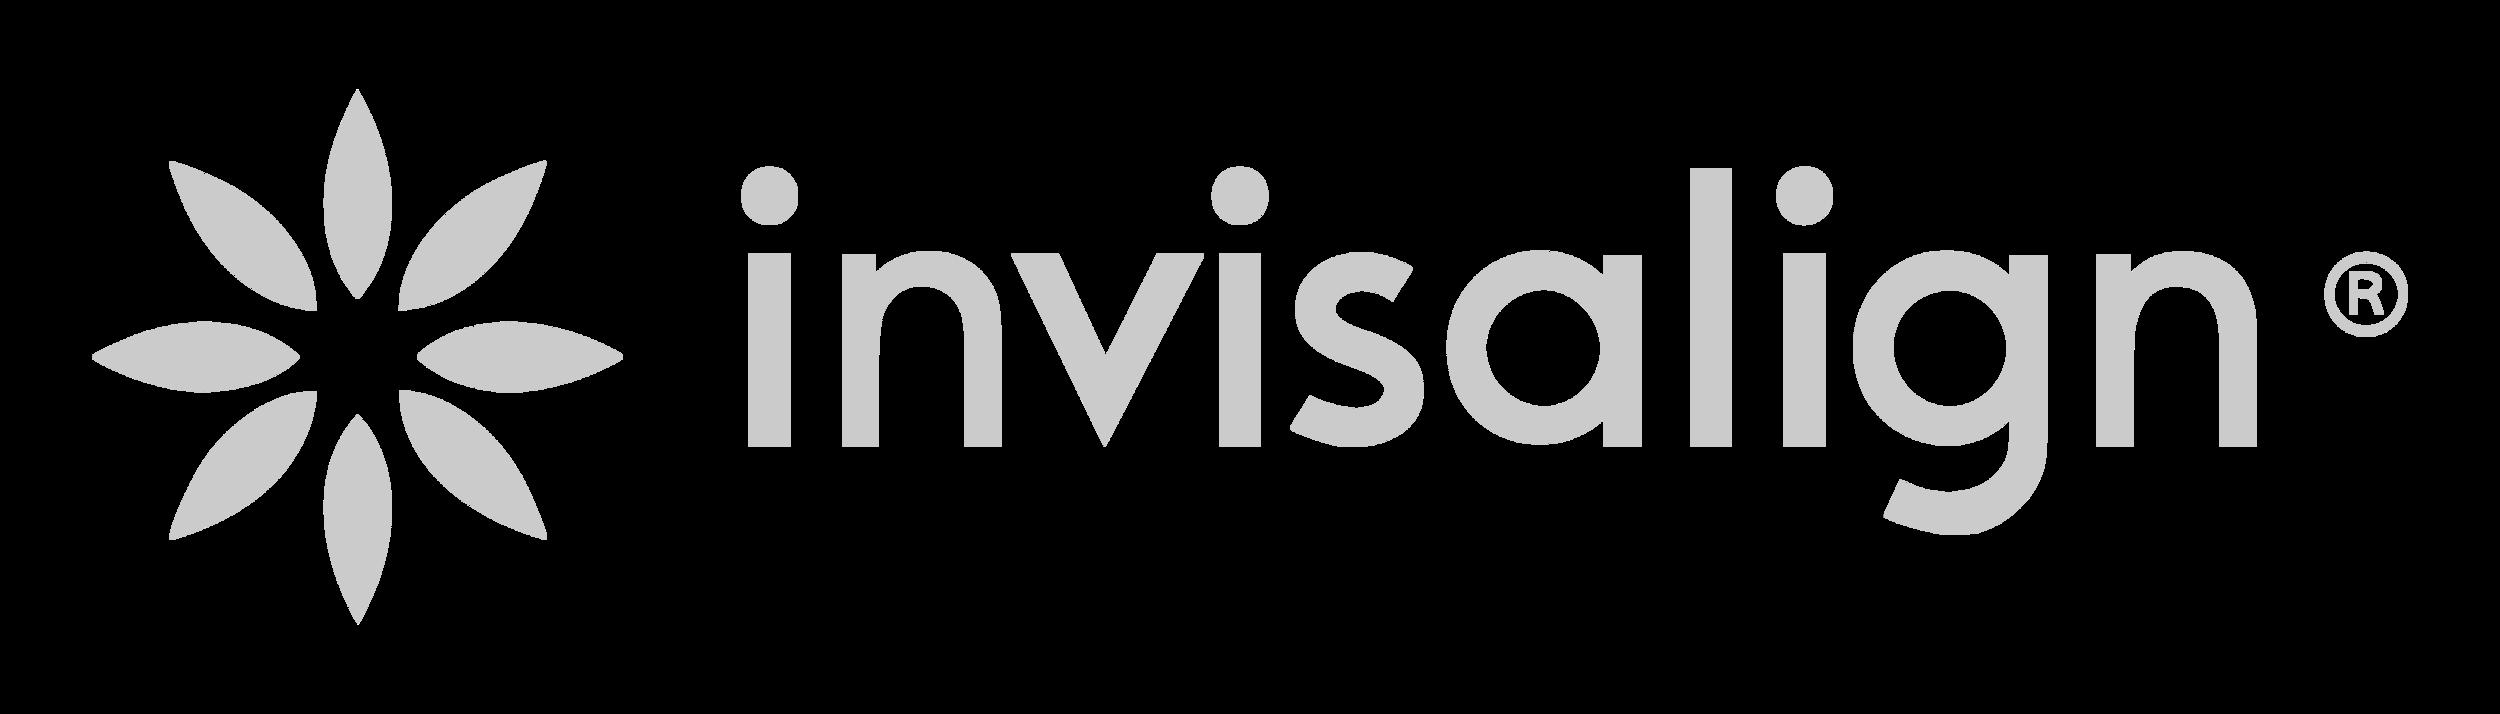 Invisalign-Logo-grey.png